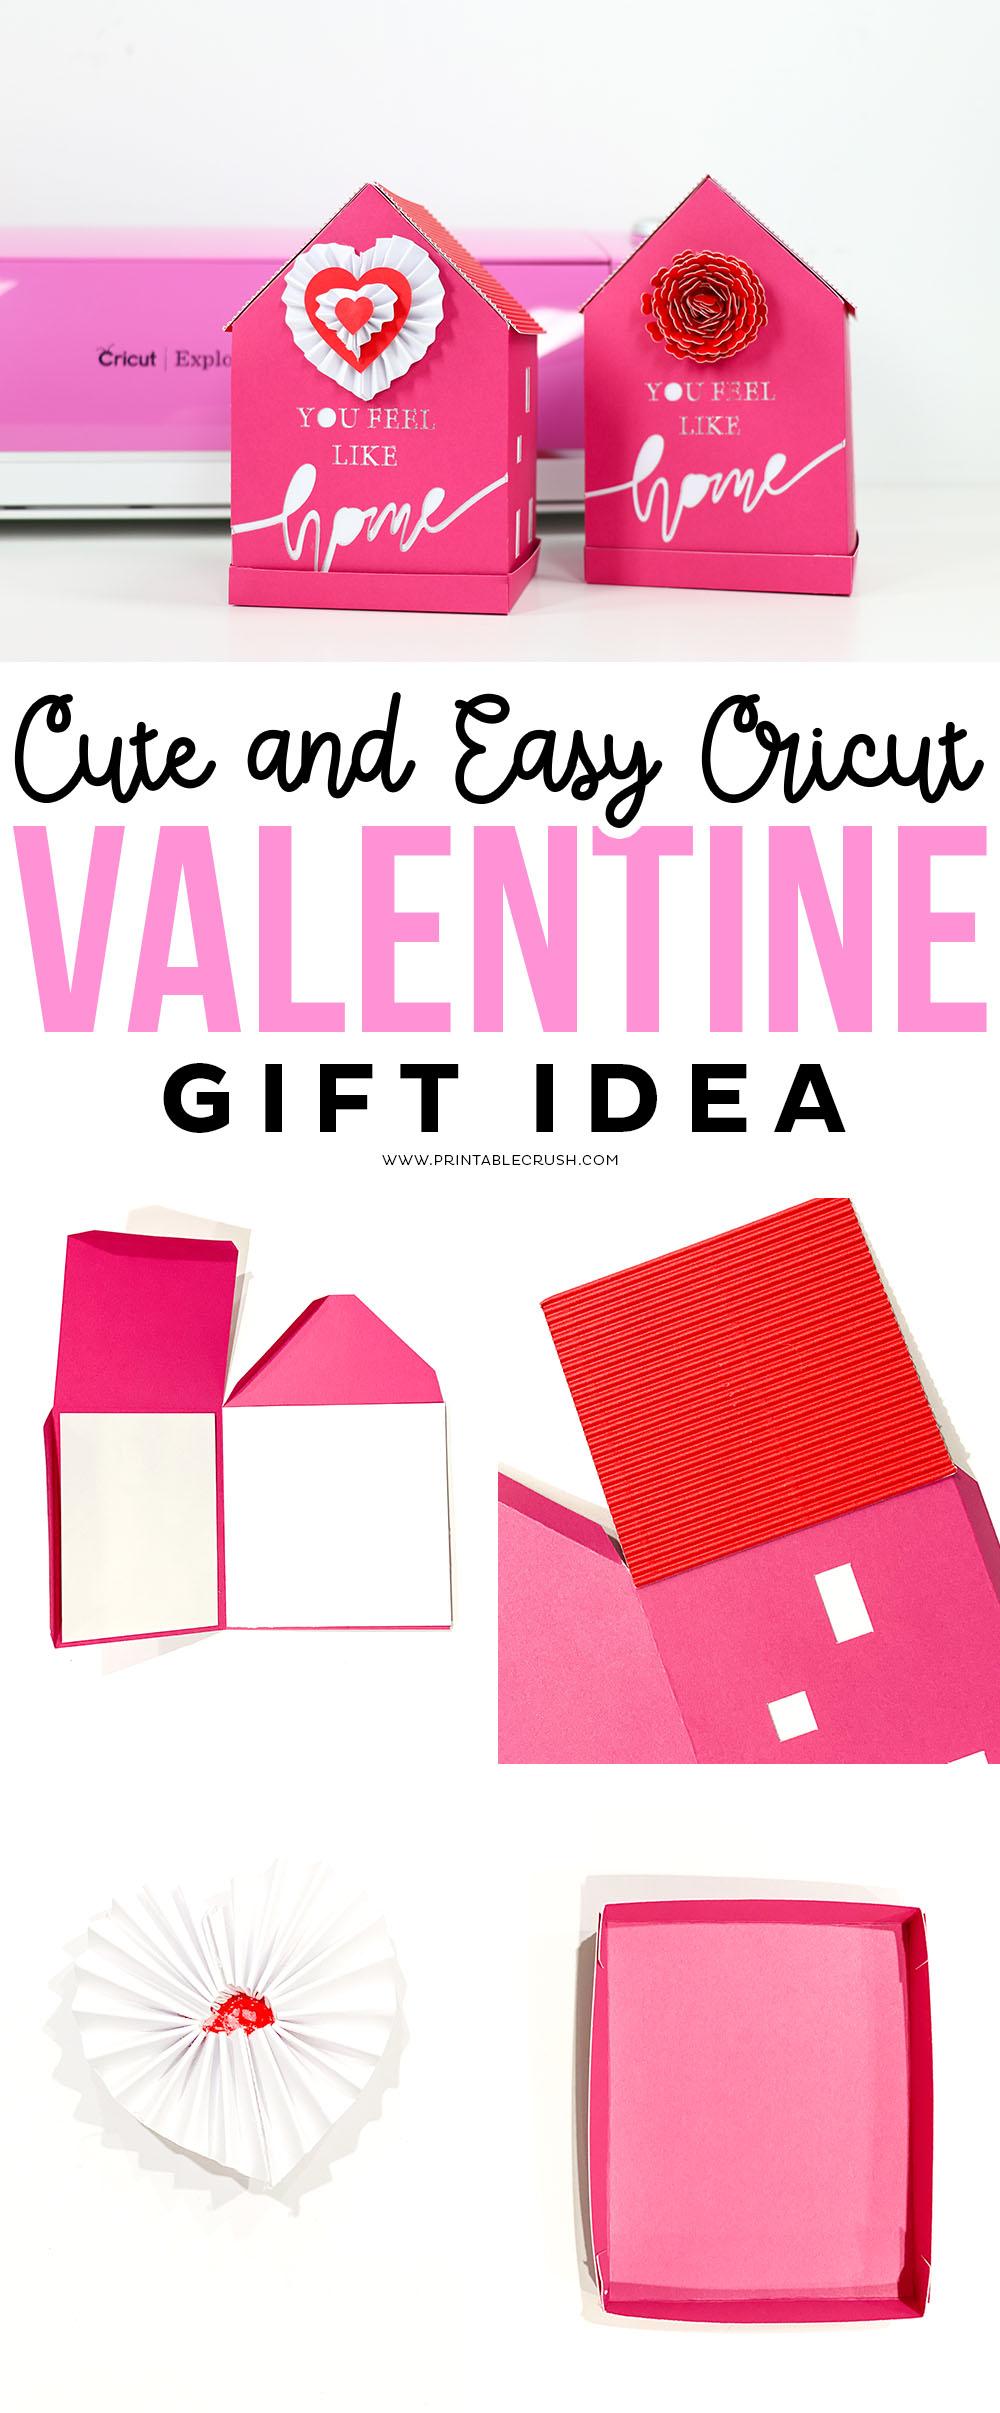 """You Feel Like Home"" Cute and Easy Cricut Valentine's Day Gift Idea"